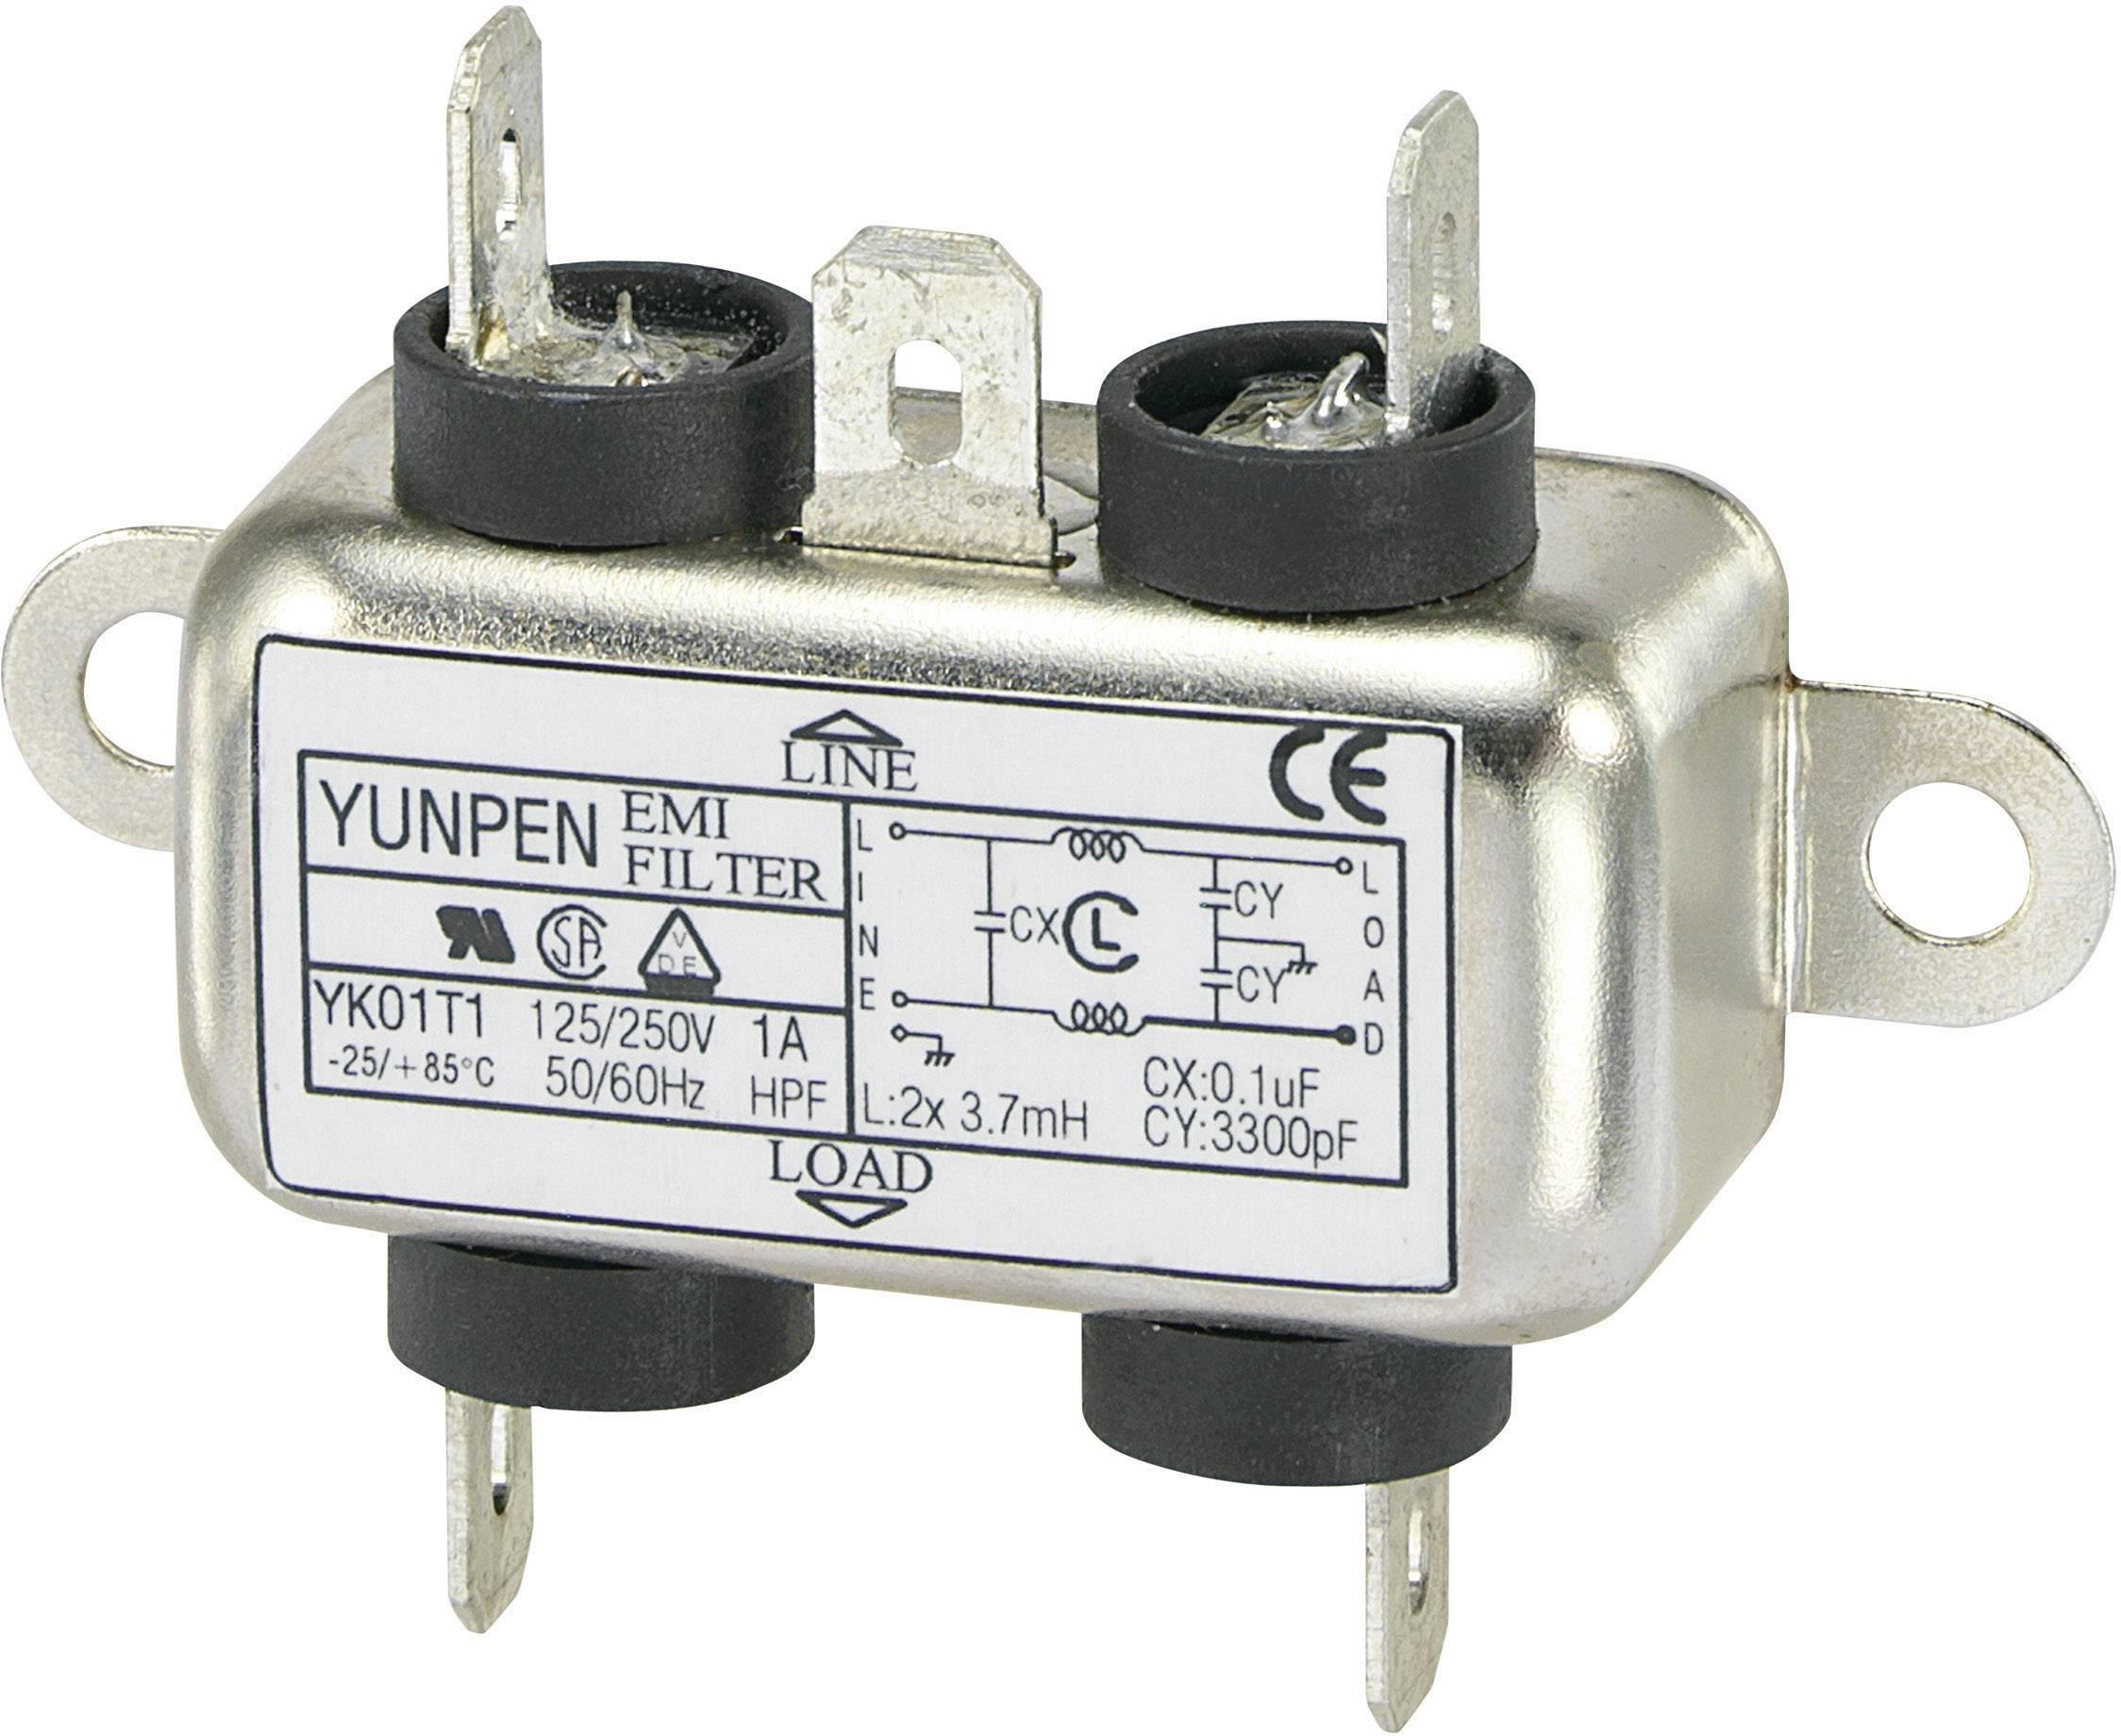 Síťový filtr Yunpen, YK01T1, 2 x 3,7 mH, 250 V/AC, 1 A